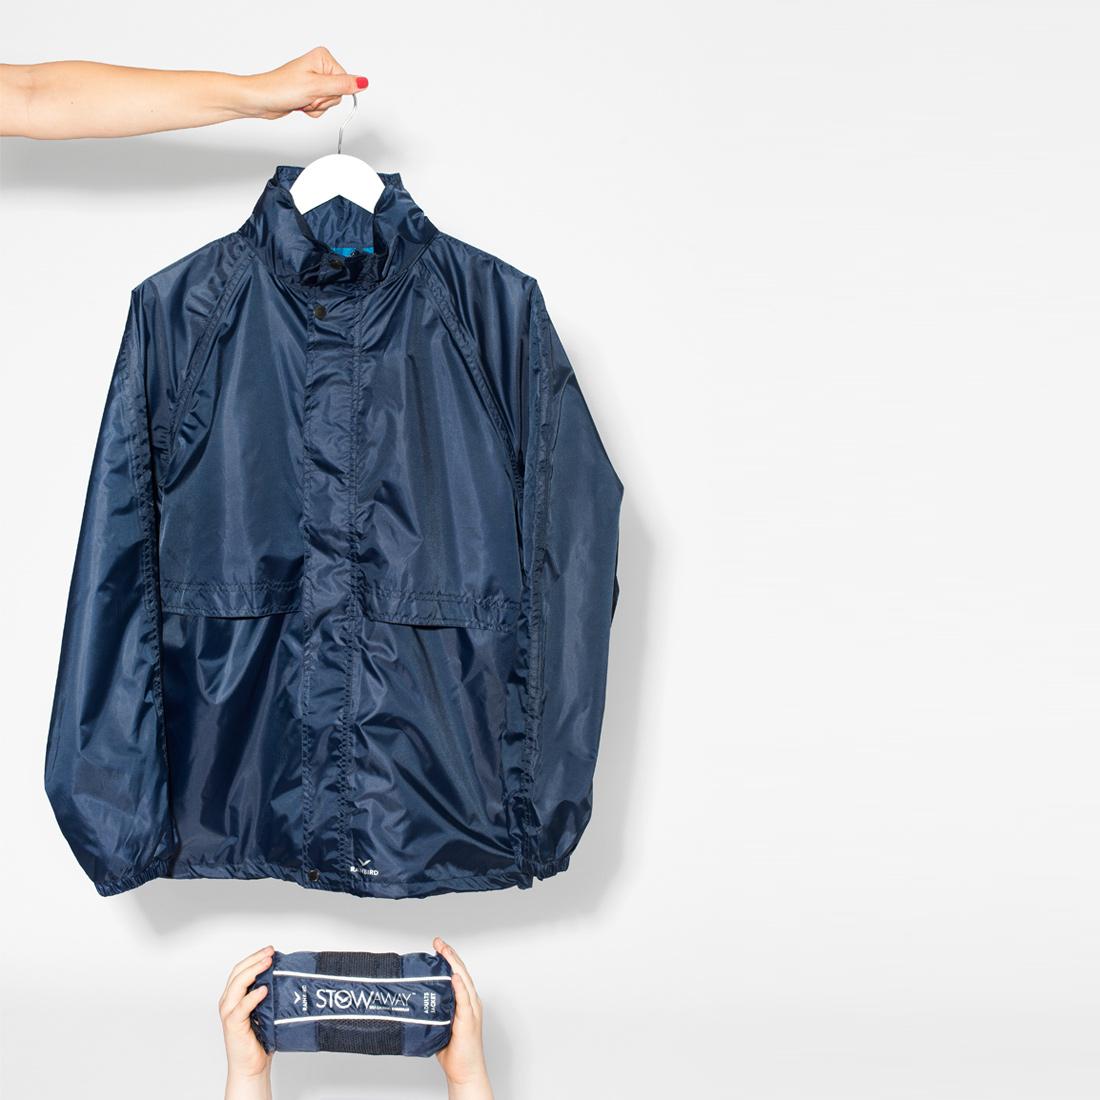 Navy STOWaway raincoat